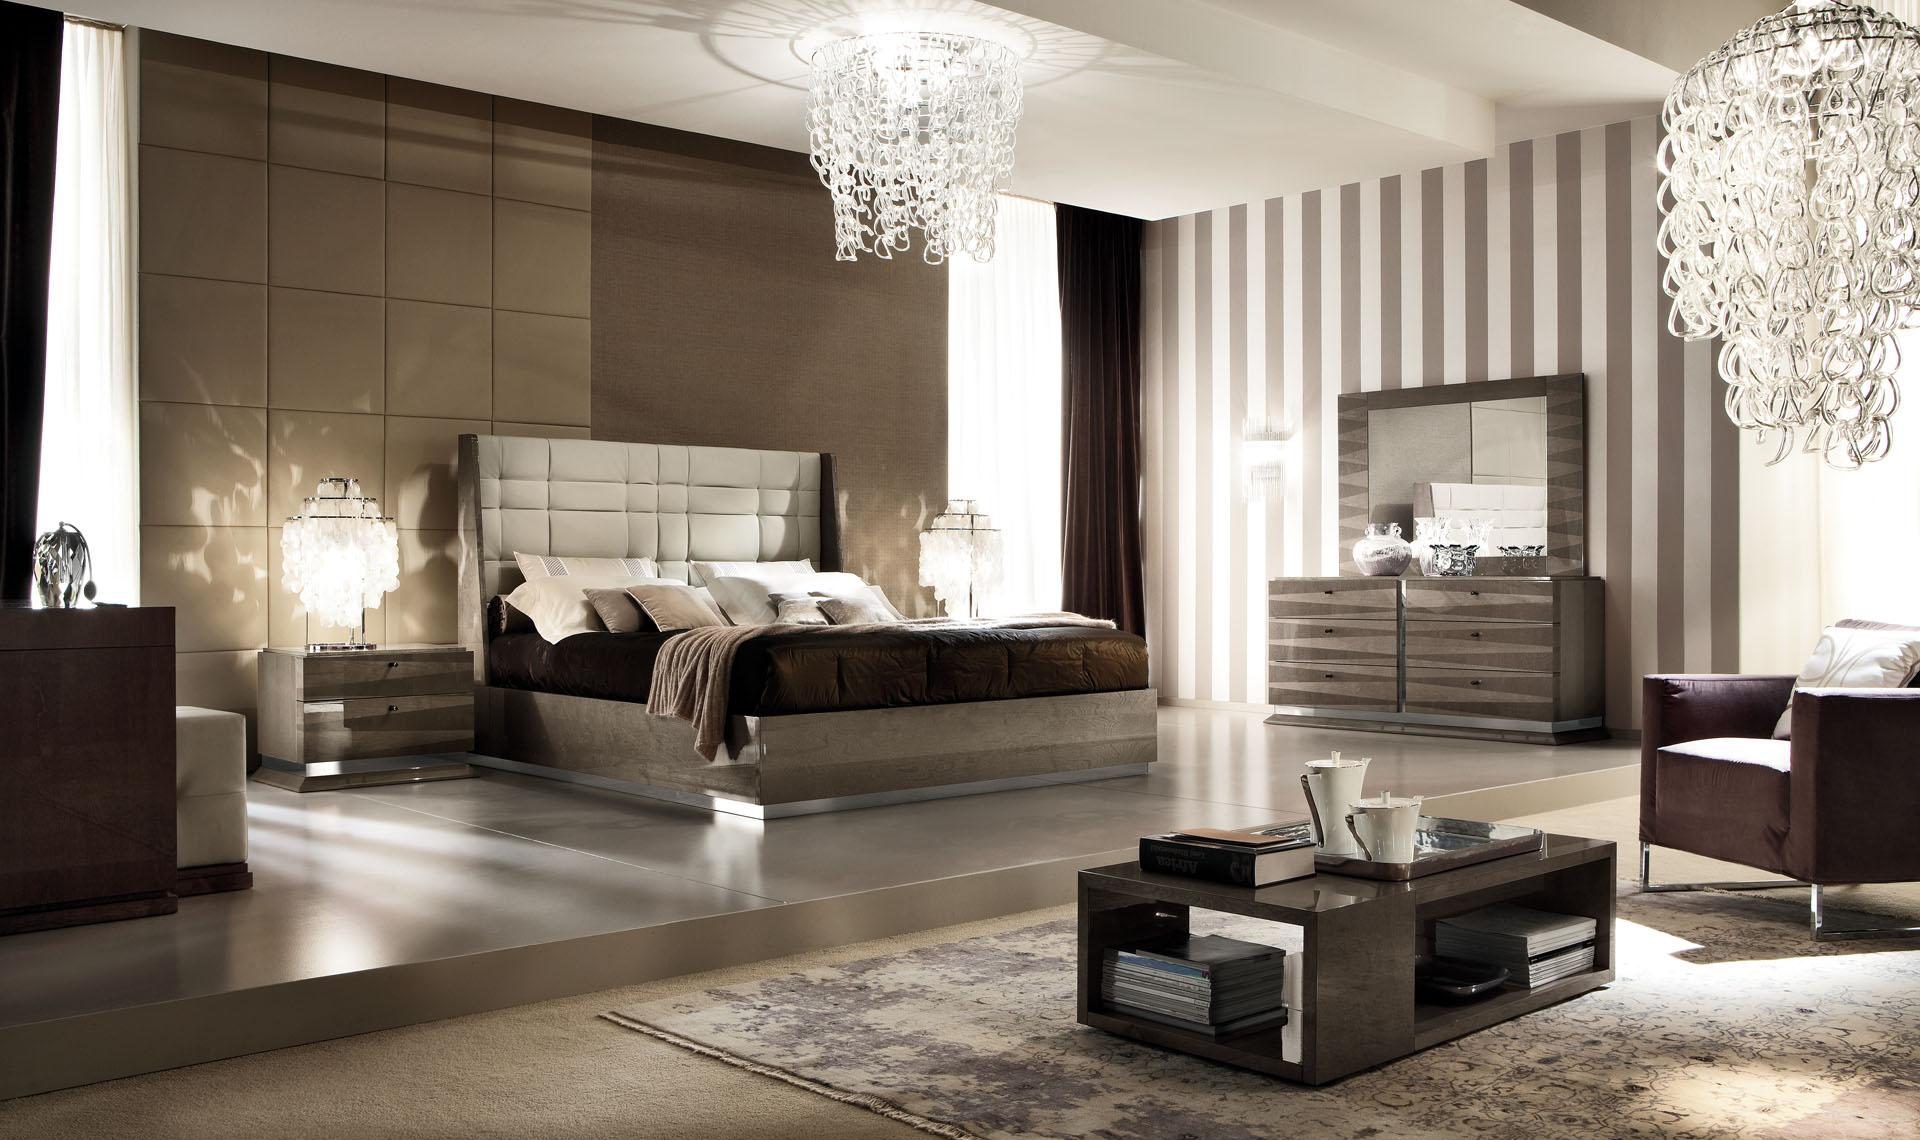 Monaco Bedroom Overview